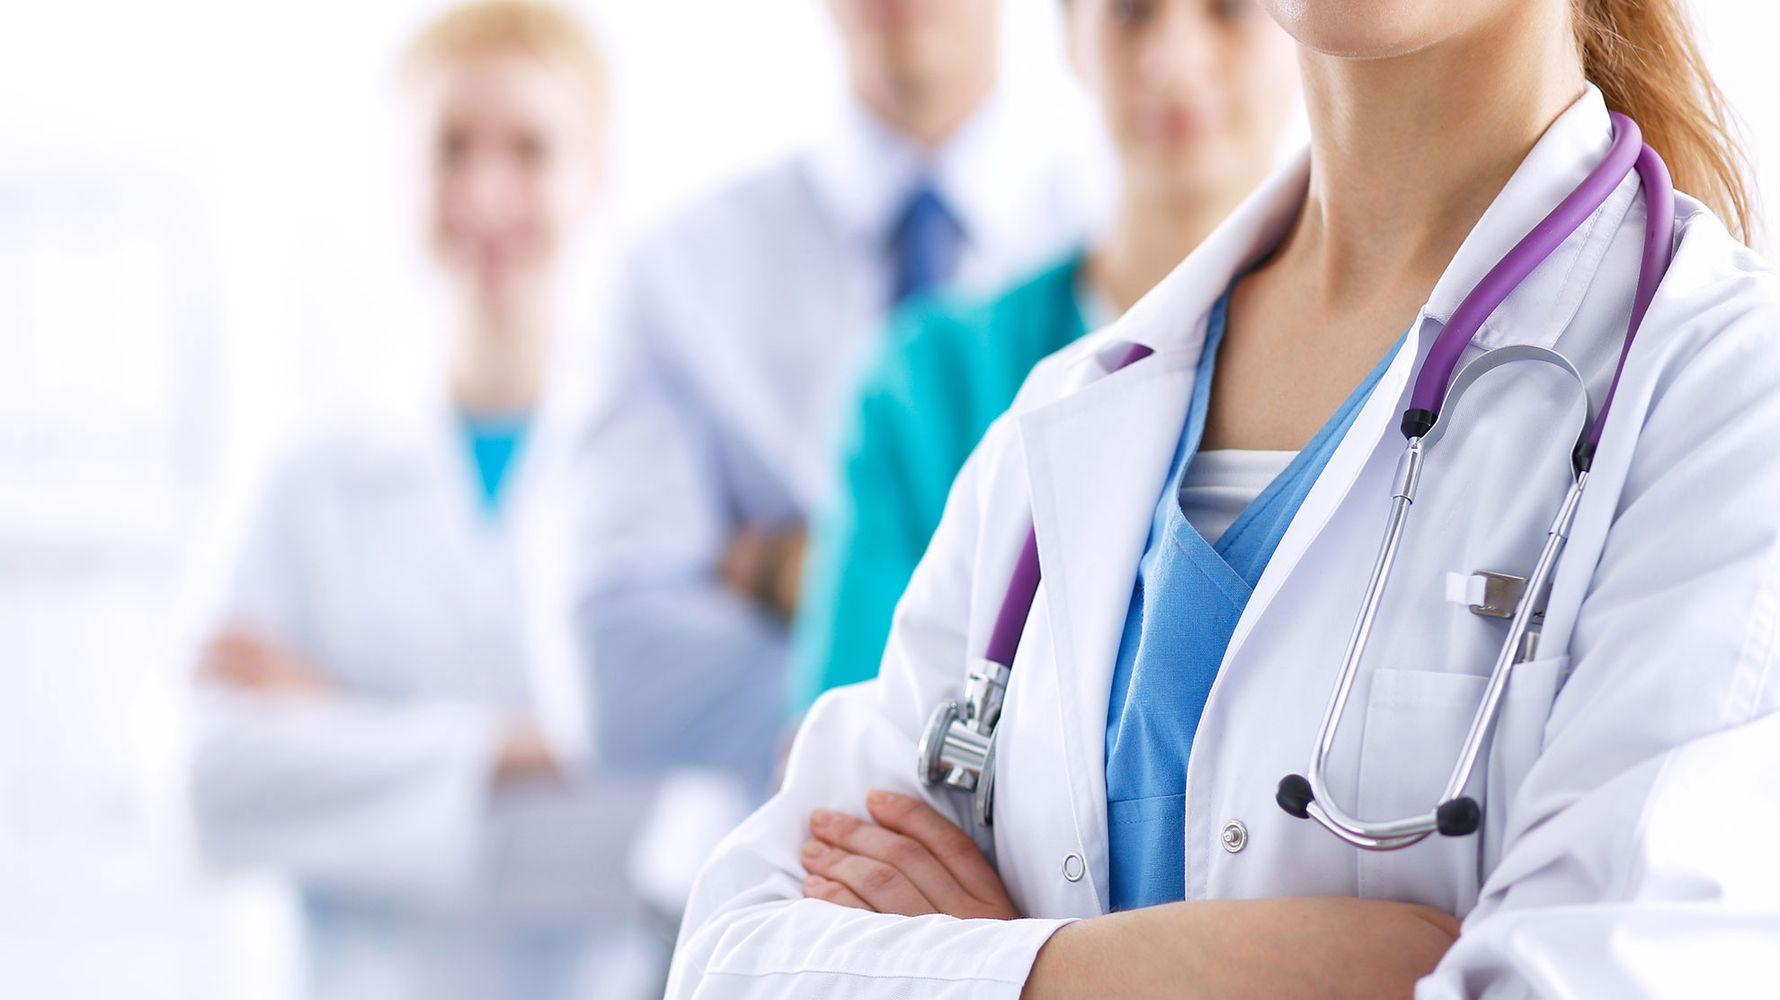 Ankara University will make contracted healthcare staff recruit